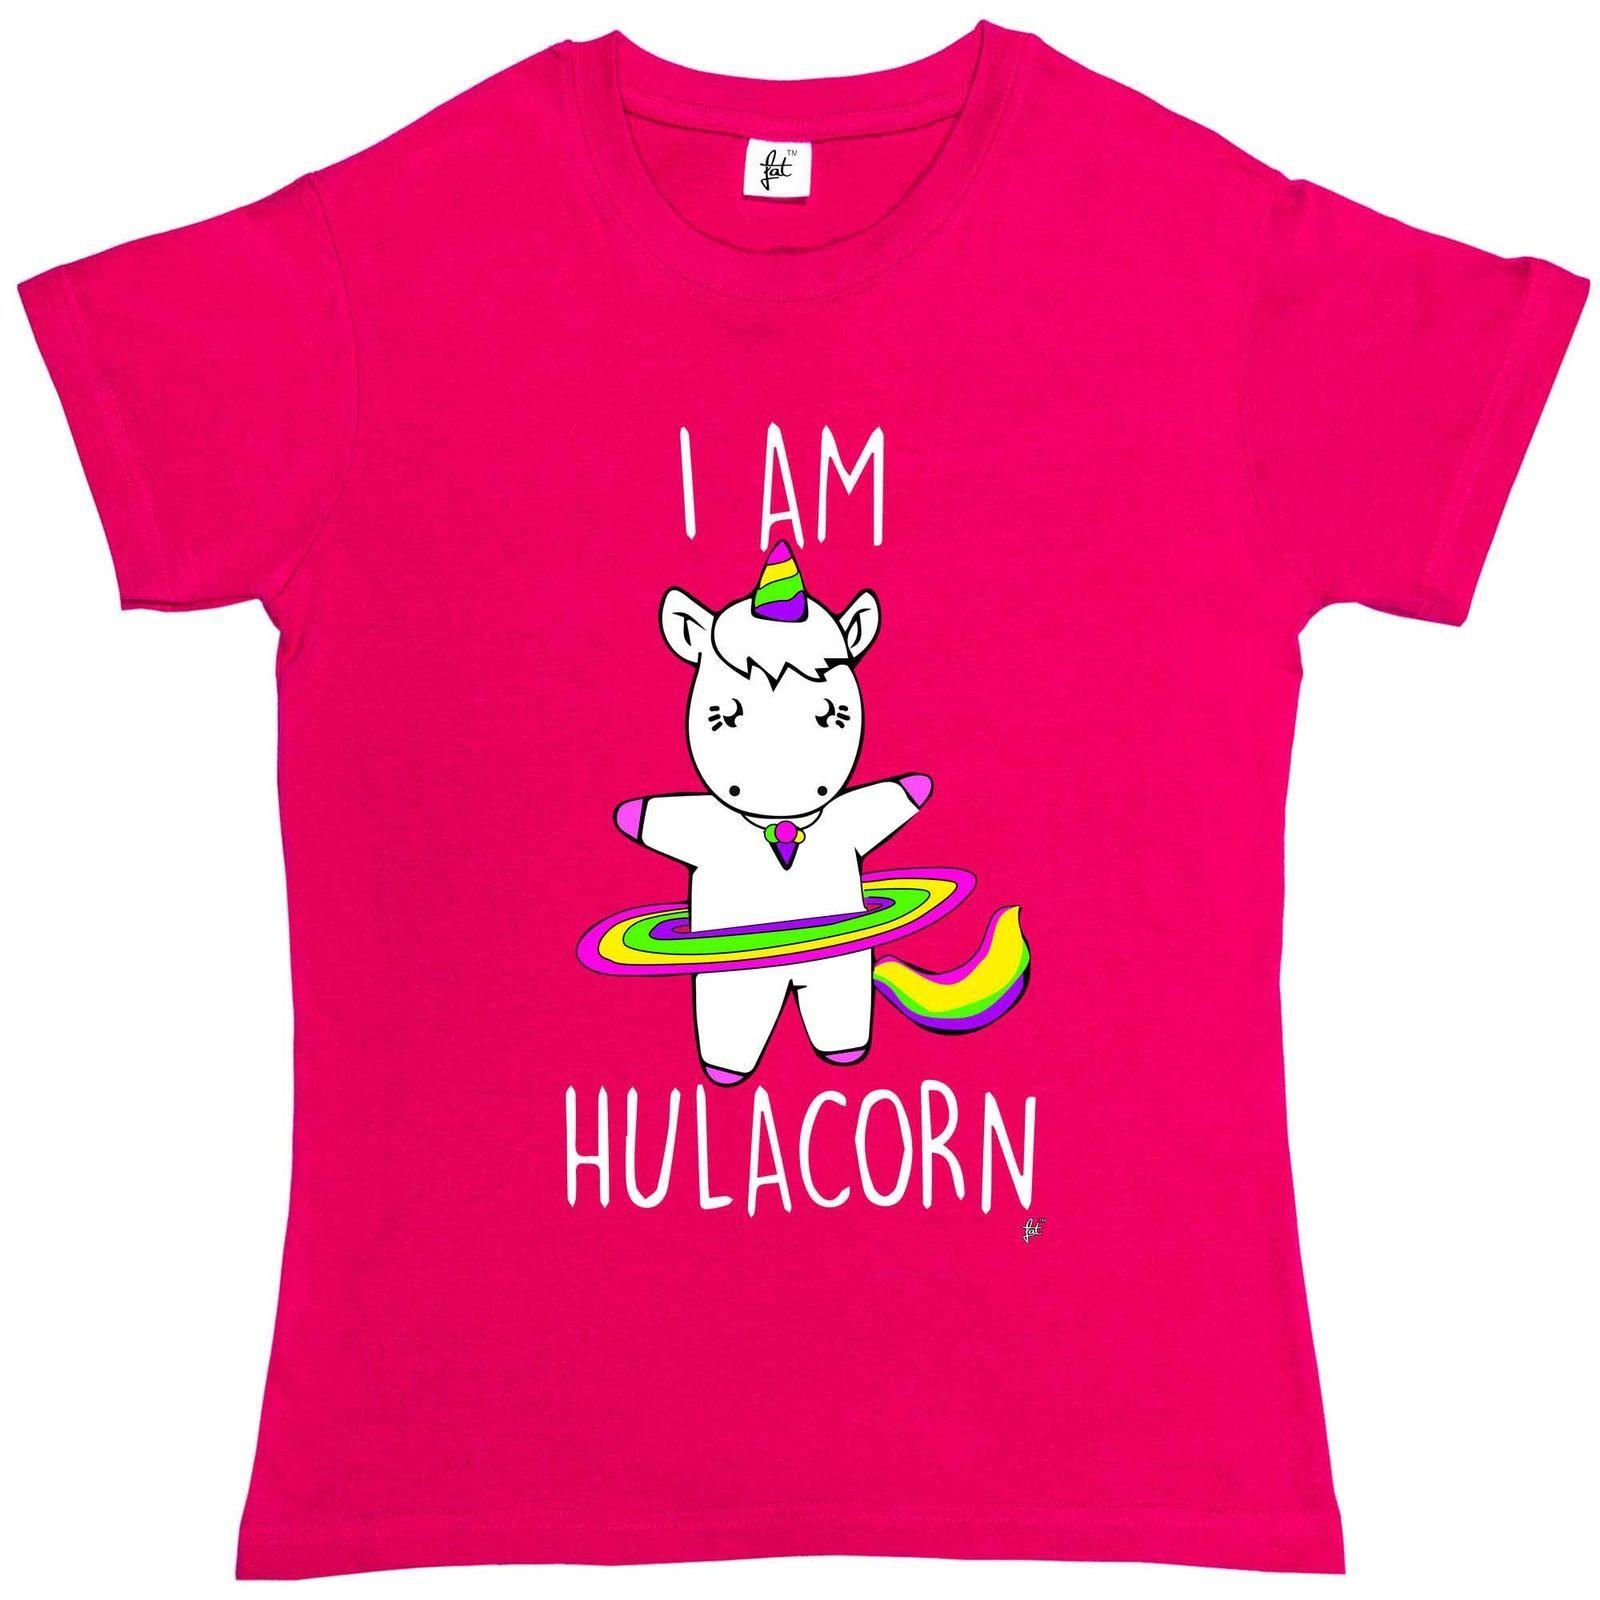 062ebe5e I Am Hulacorn Super Cute Unicorn Using Hula Hoop Womens Ladies T ShirtFunny  Unisex Casual Tshirt Top Print T Shirt Slogan T Shirts From Mvptshirt, ...